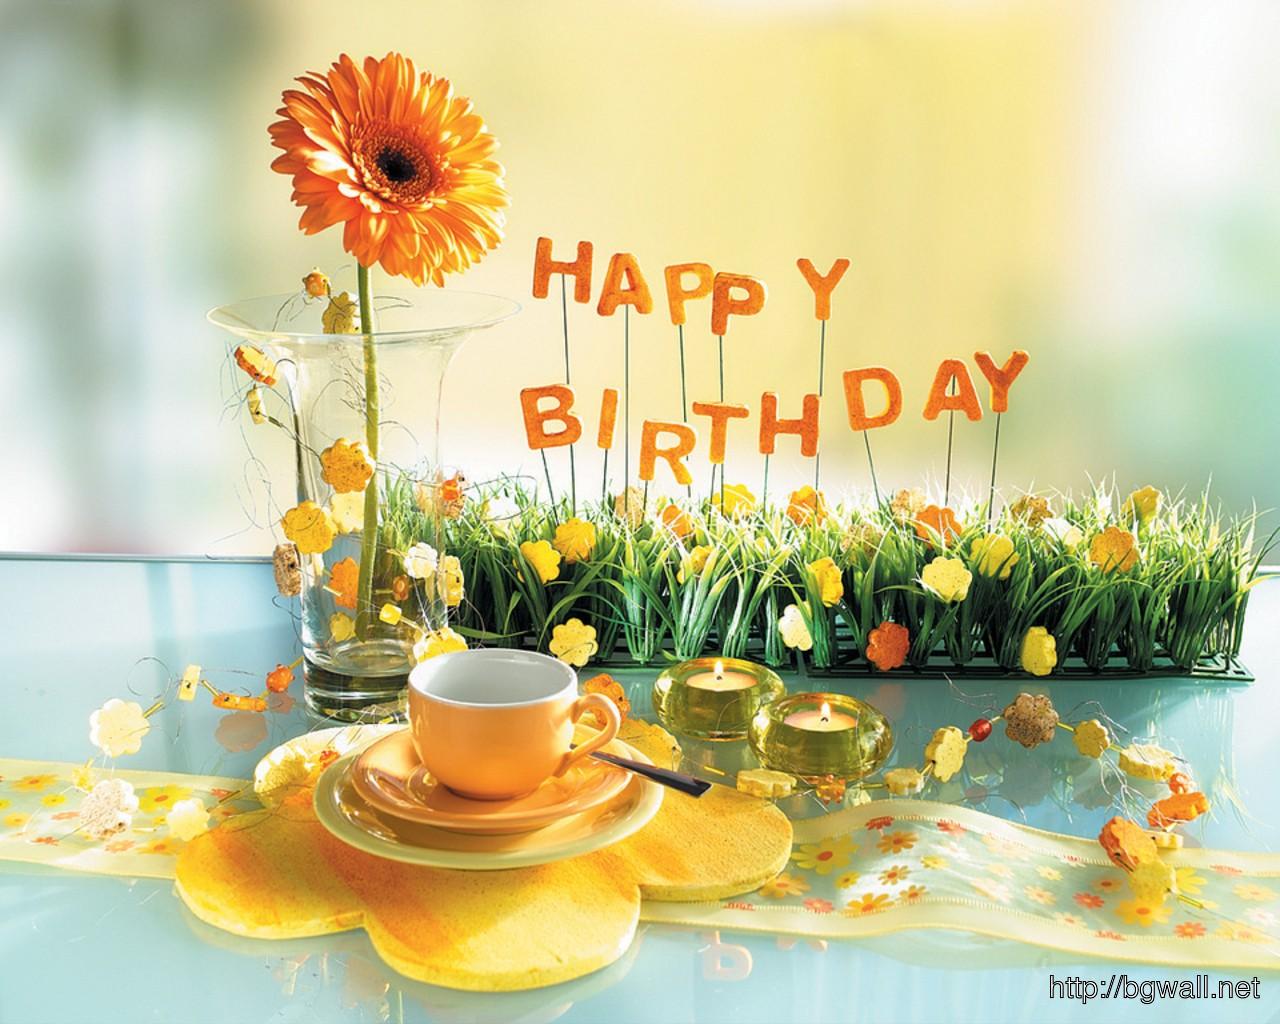 Happy-Birthday-Desktop-Wallpaper